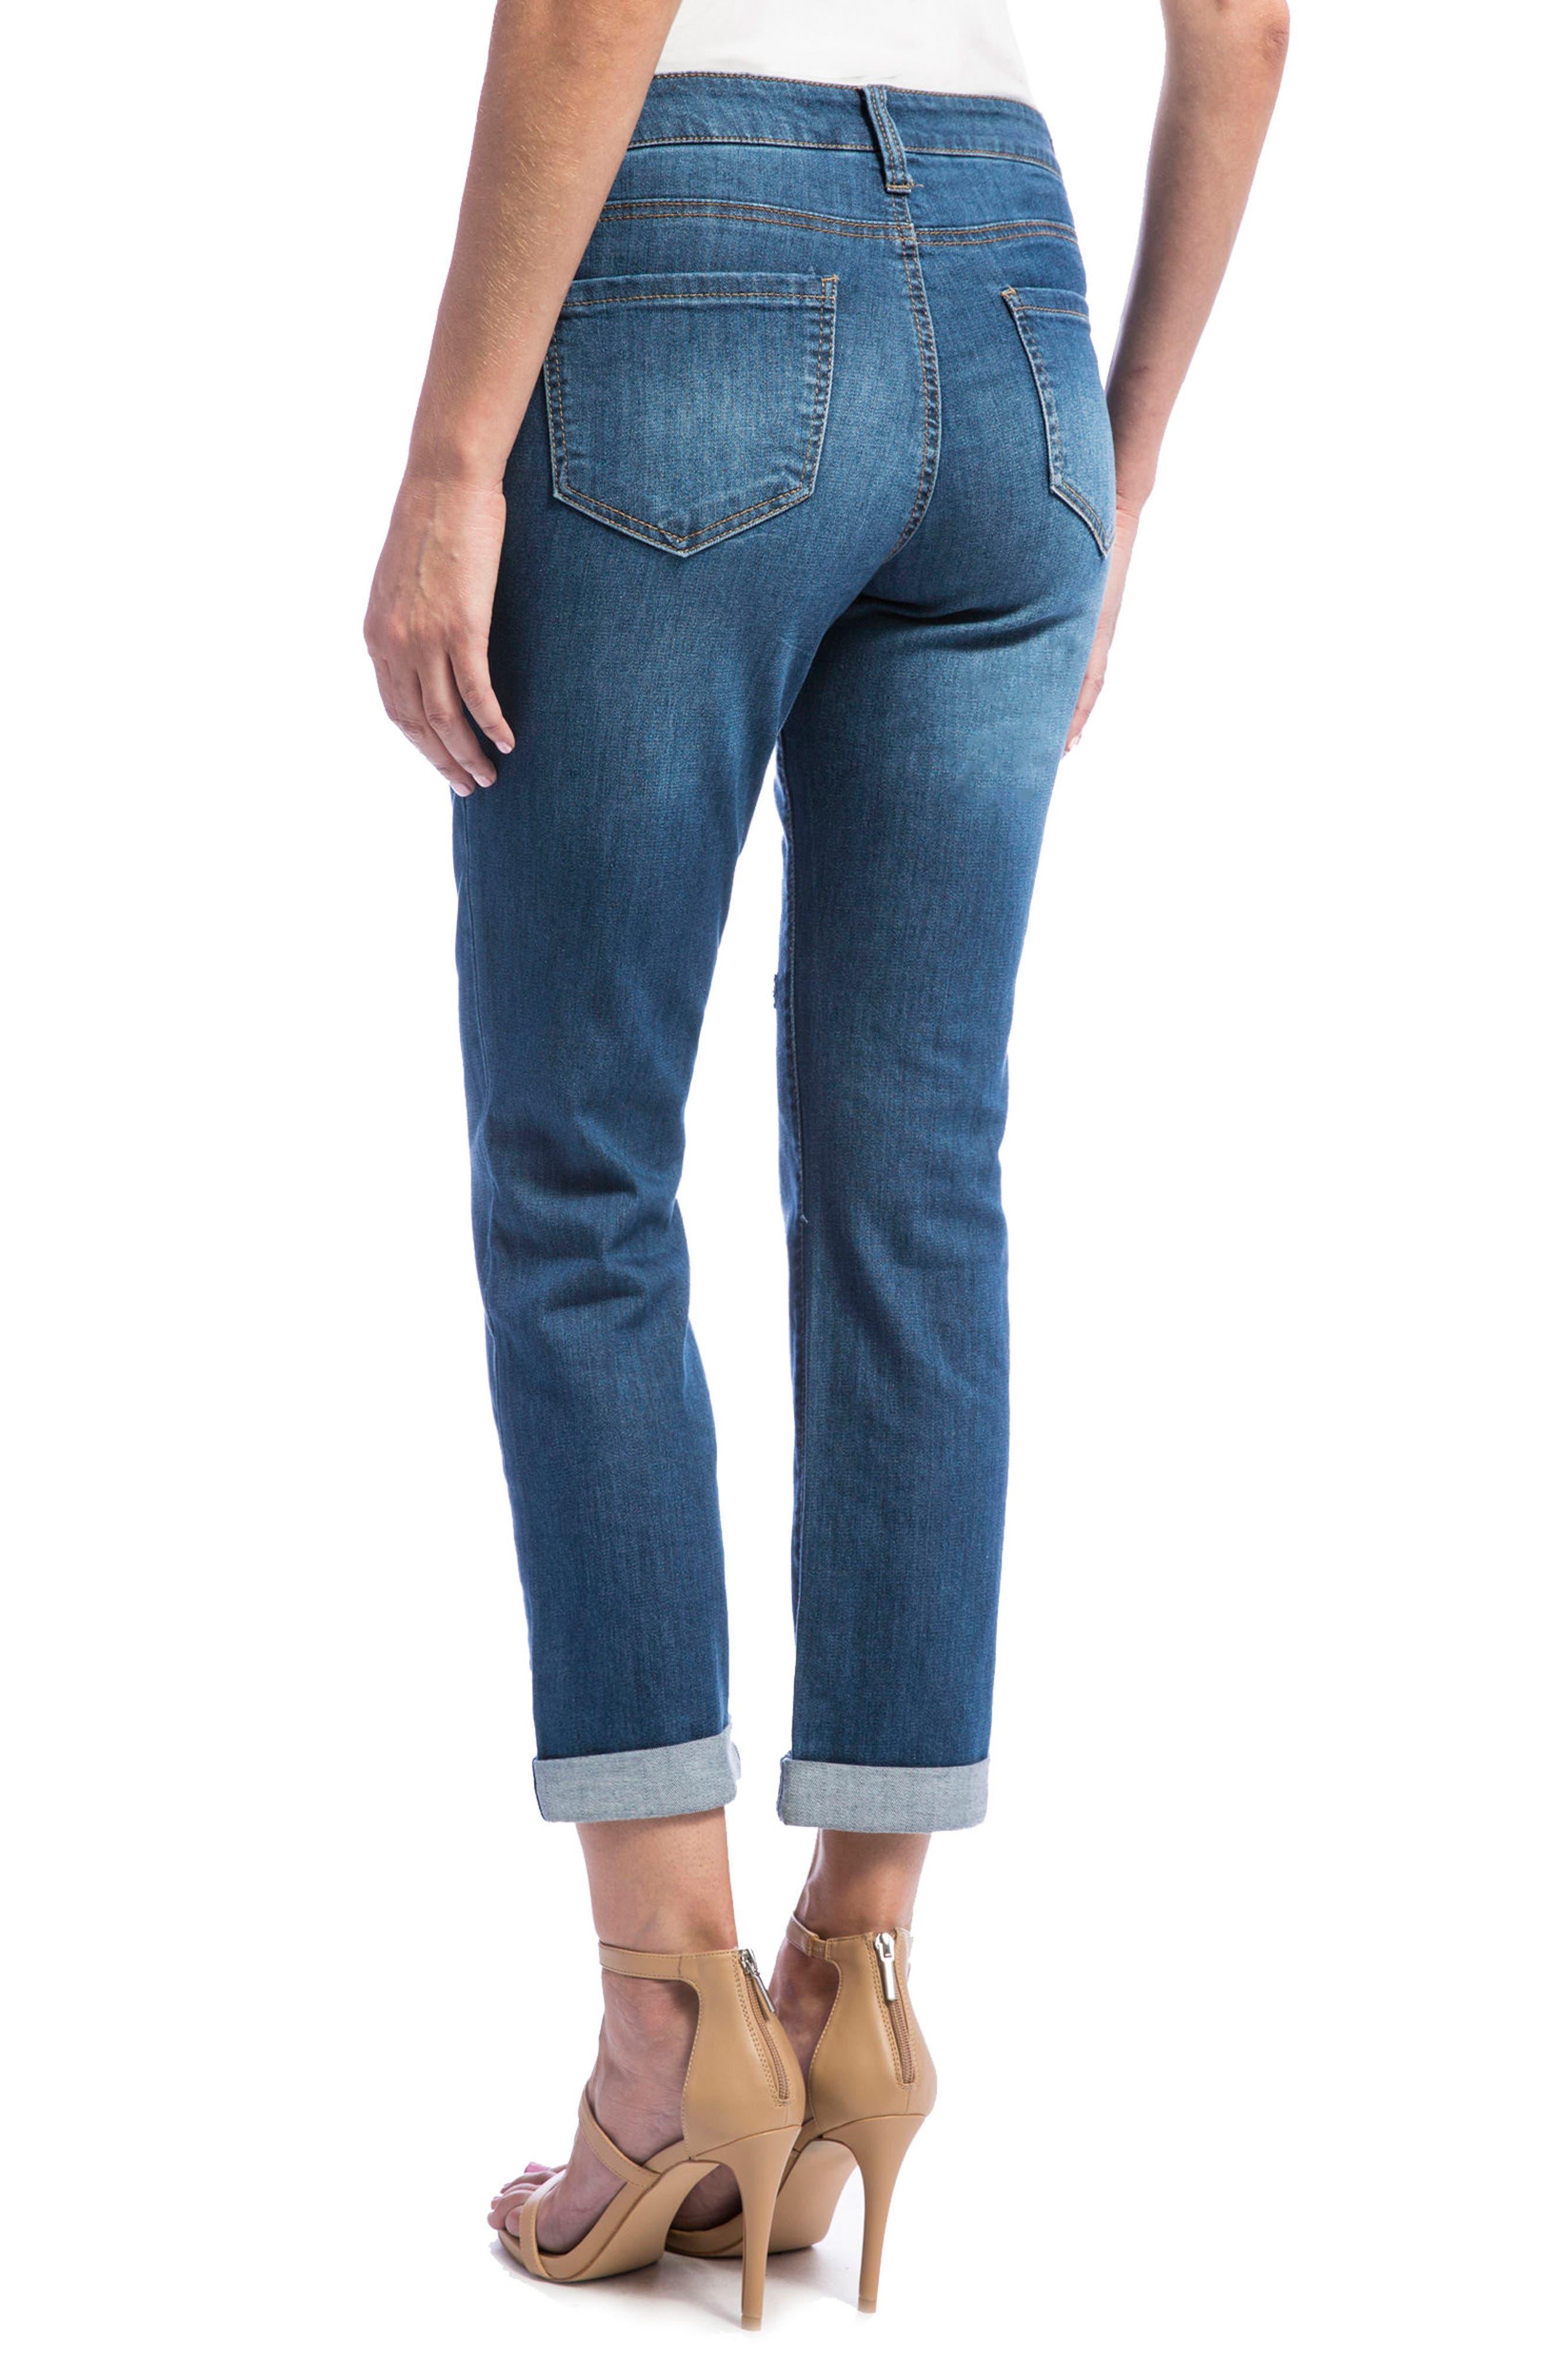 Jeans Company Peyton Slim Stretch Crop Boyfriend Jeans,                             Alternate thumbnail 2, color,                             Montauk Mid/ Destruction